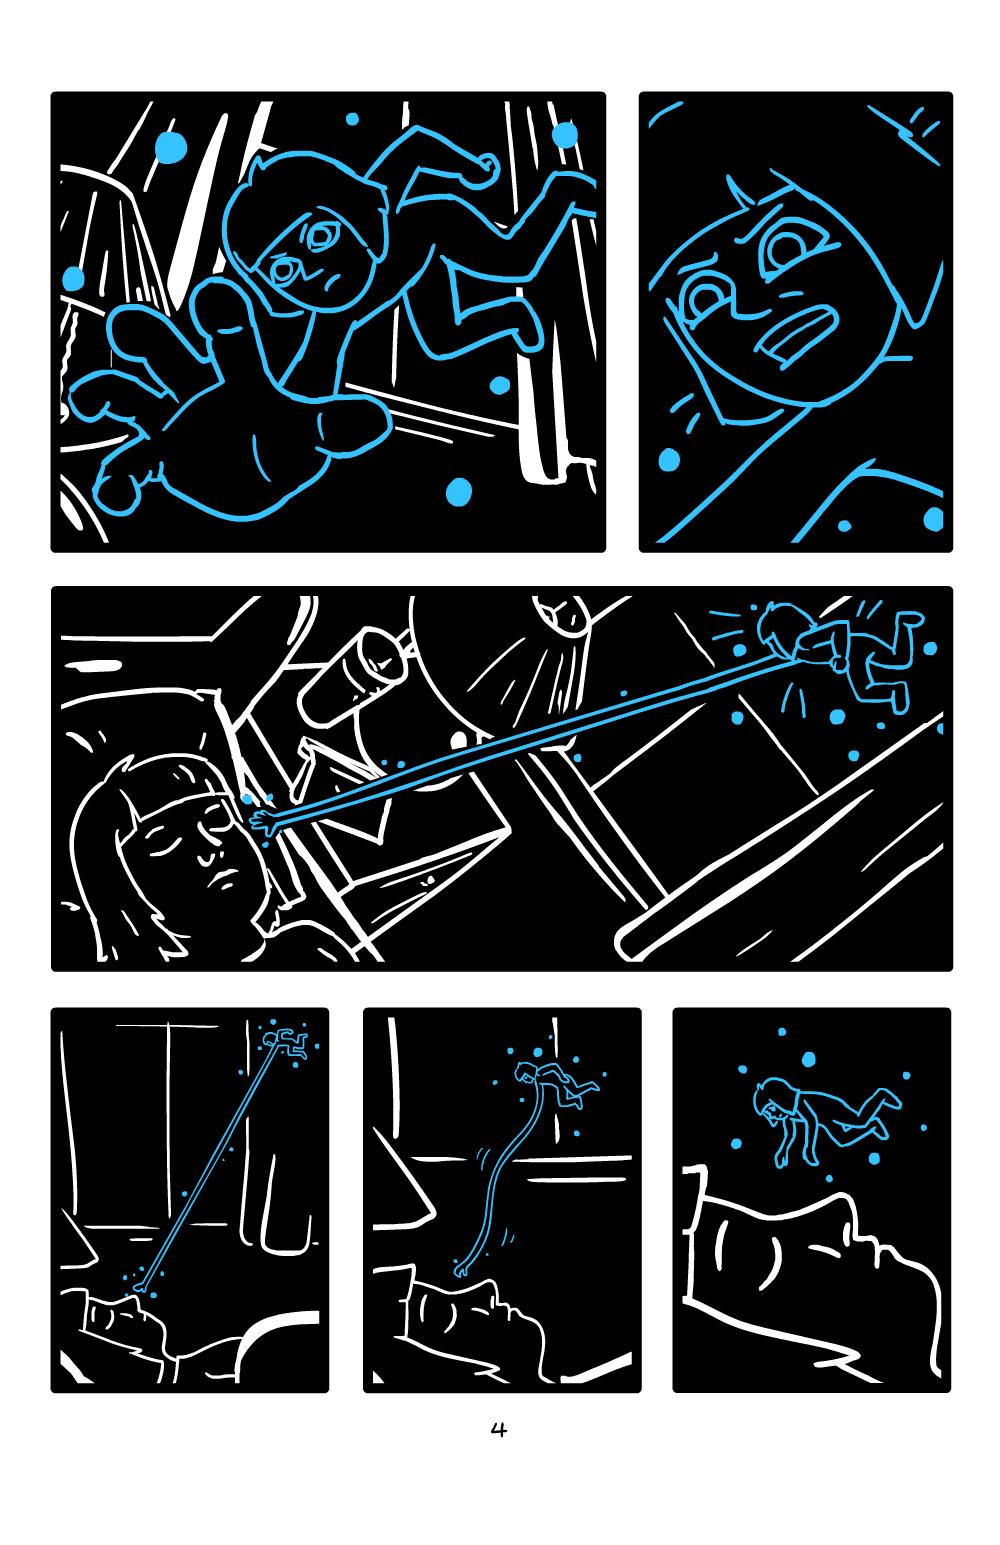 The-Body-Sleeps-9-15-04.jpg